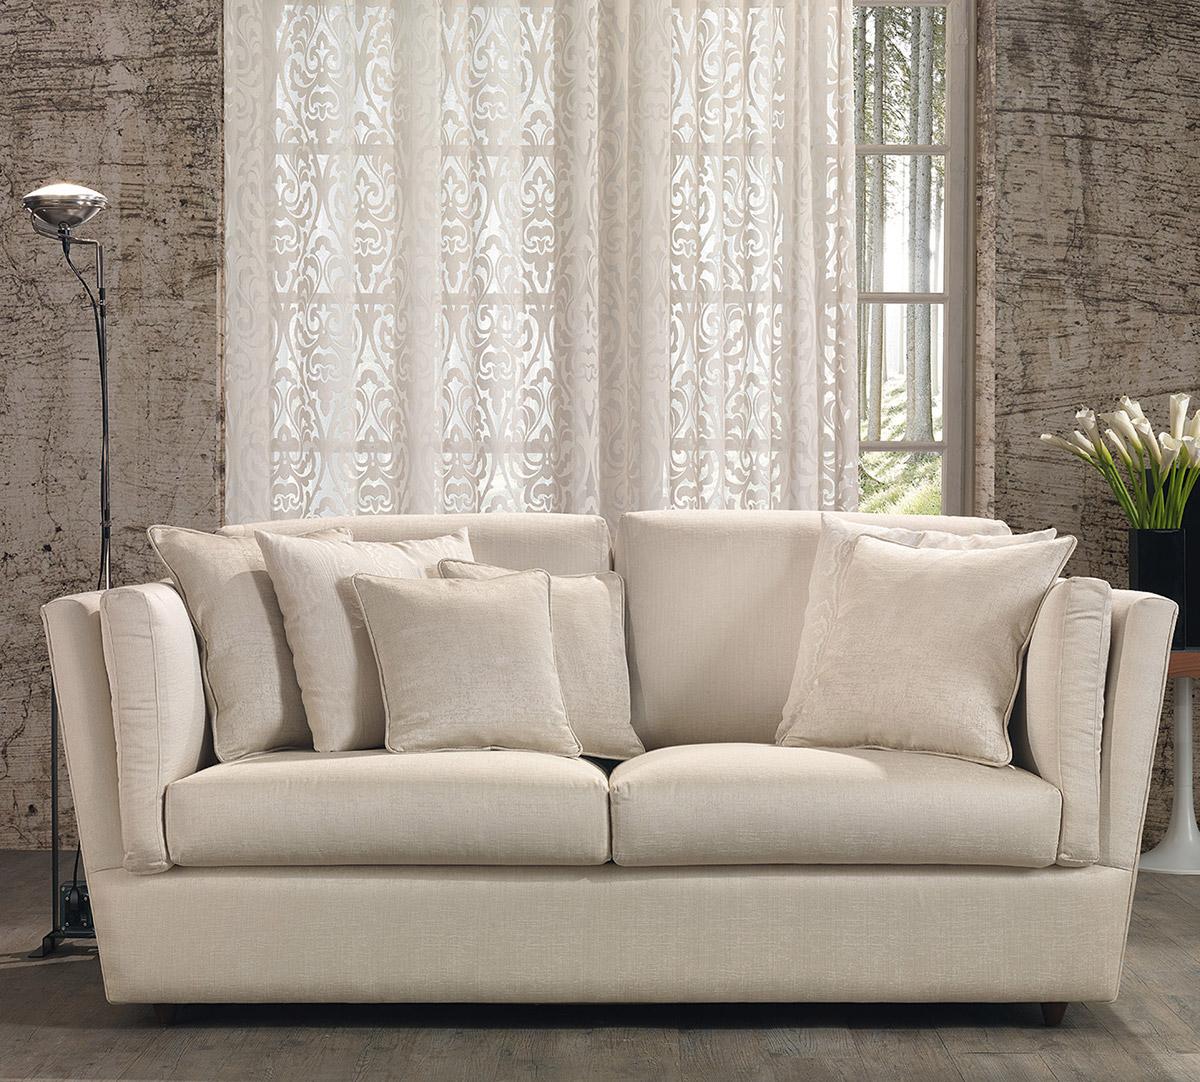 rivestimenti per divani rivestimenti per divani vendita